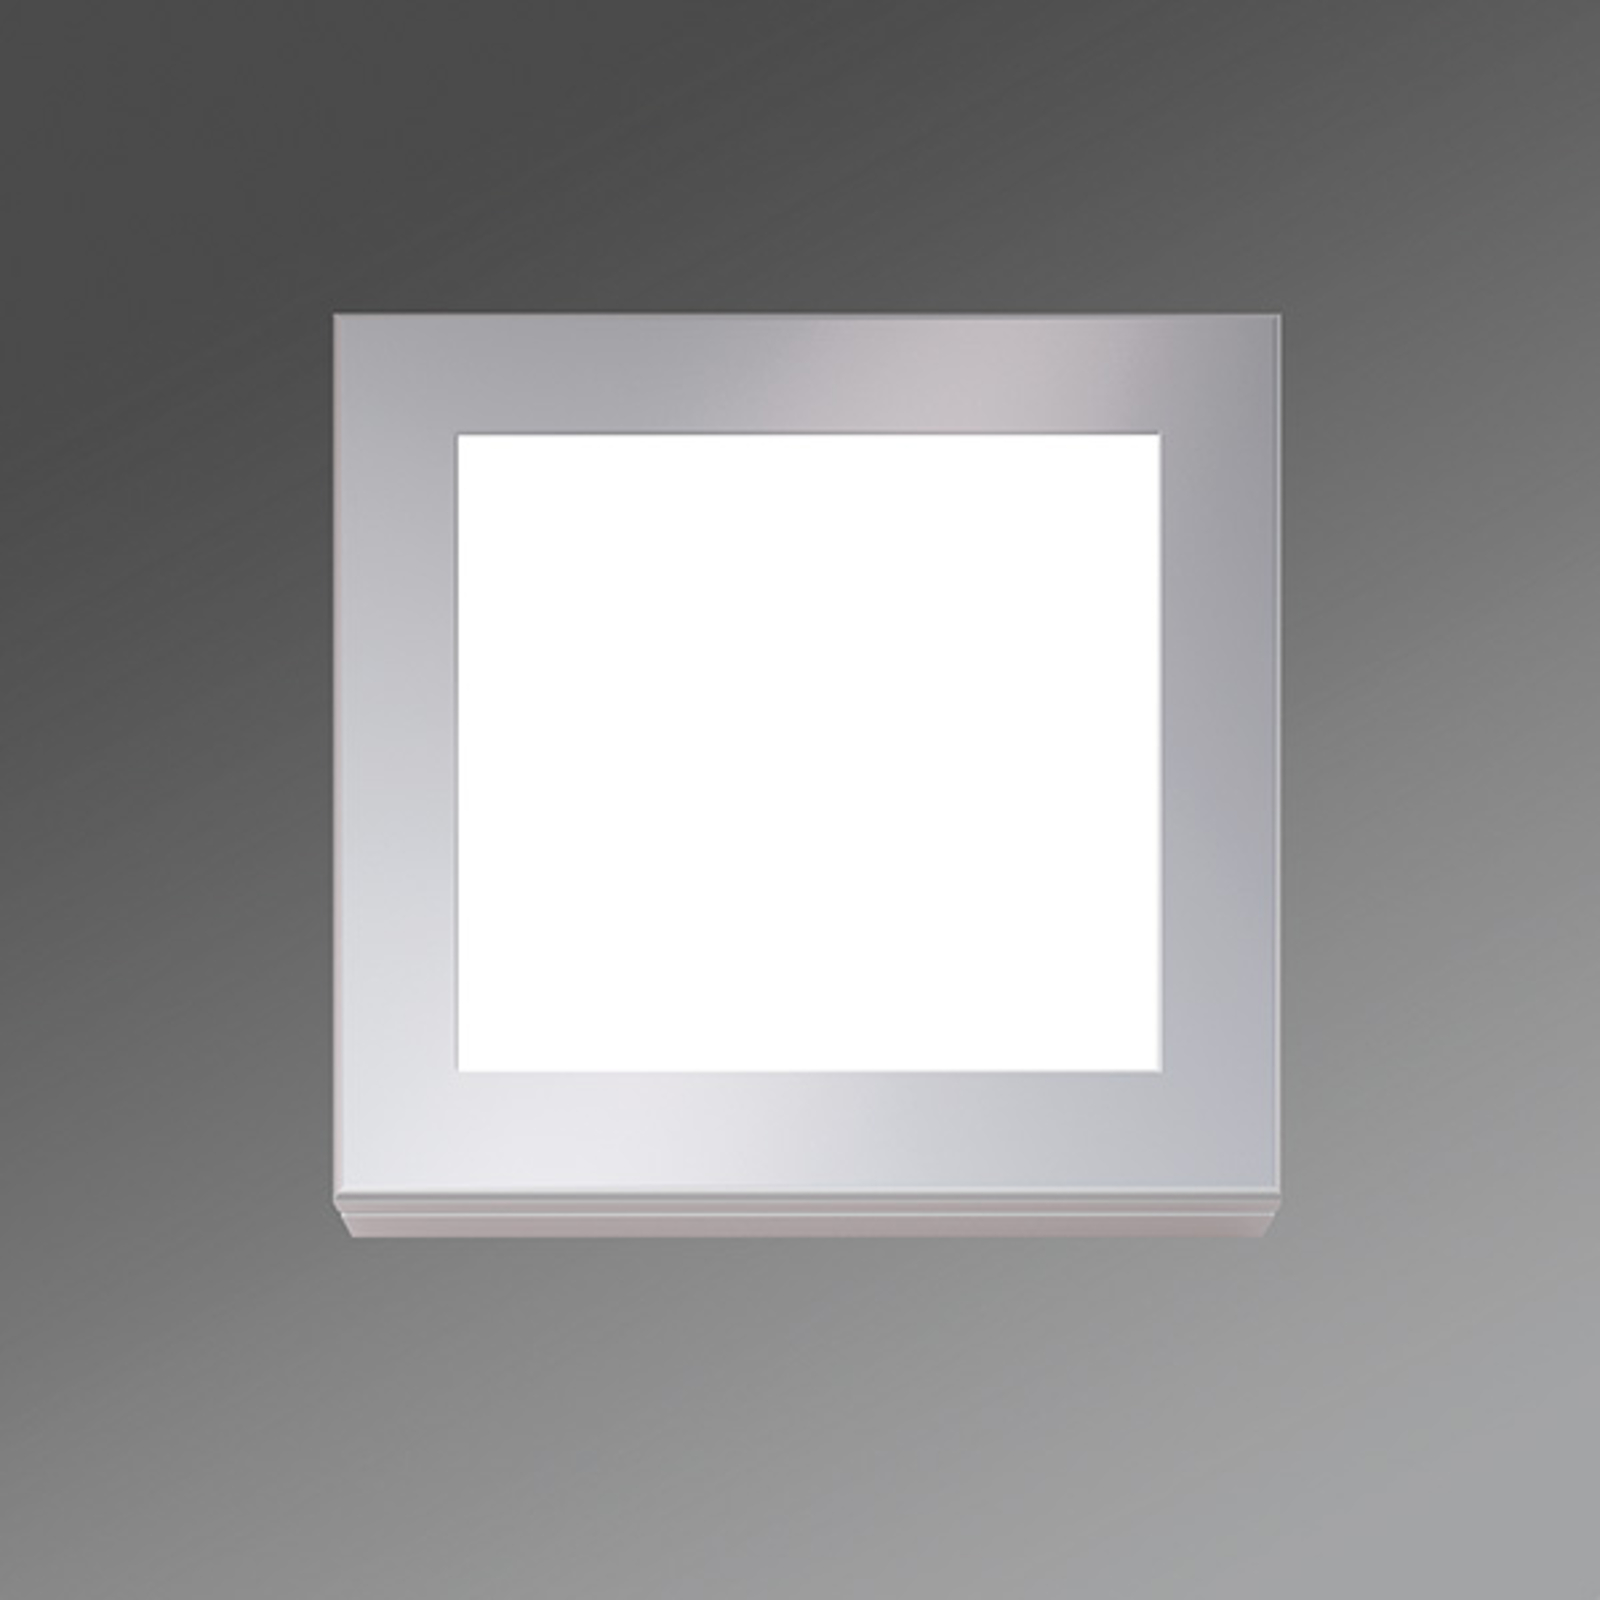 Applique LED Lampe Visula-VSWIG rectangulaire 12W